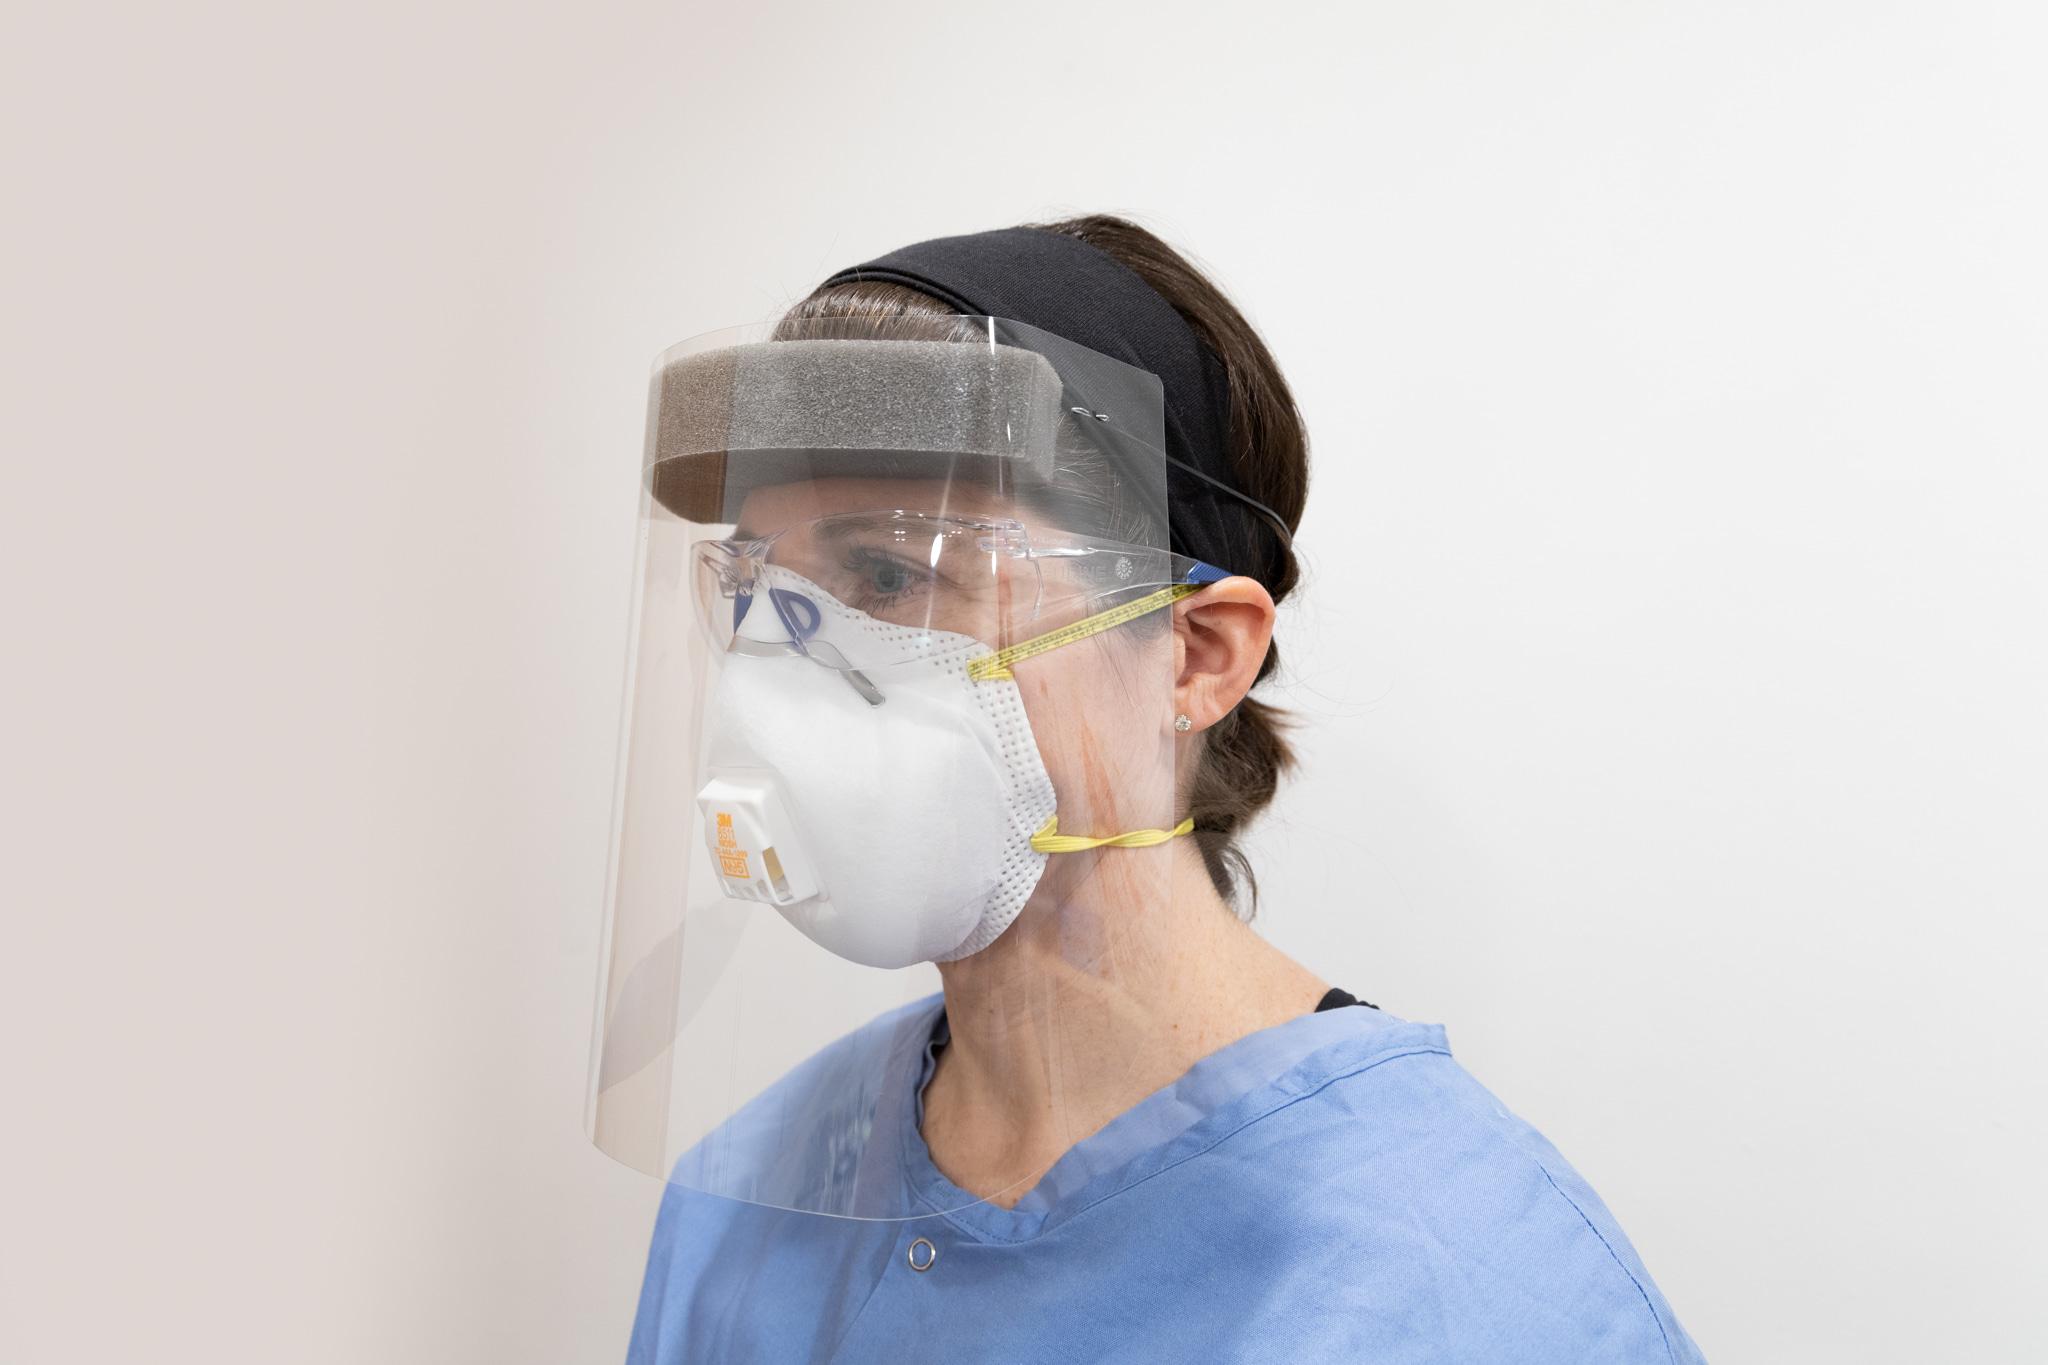 Spartek QRS Generation 1 Single-Use Disposable Face Shield